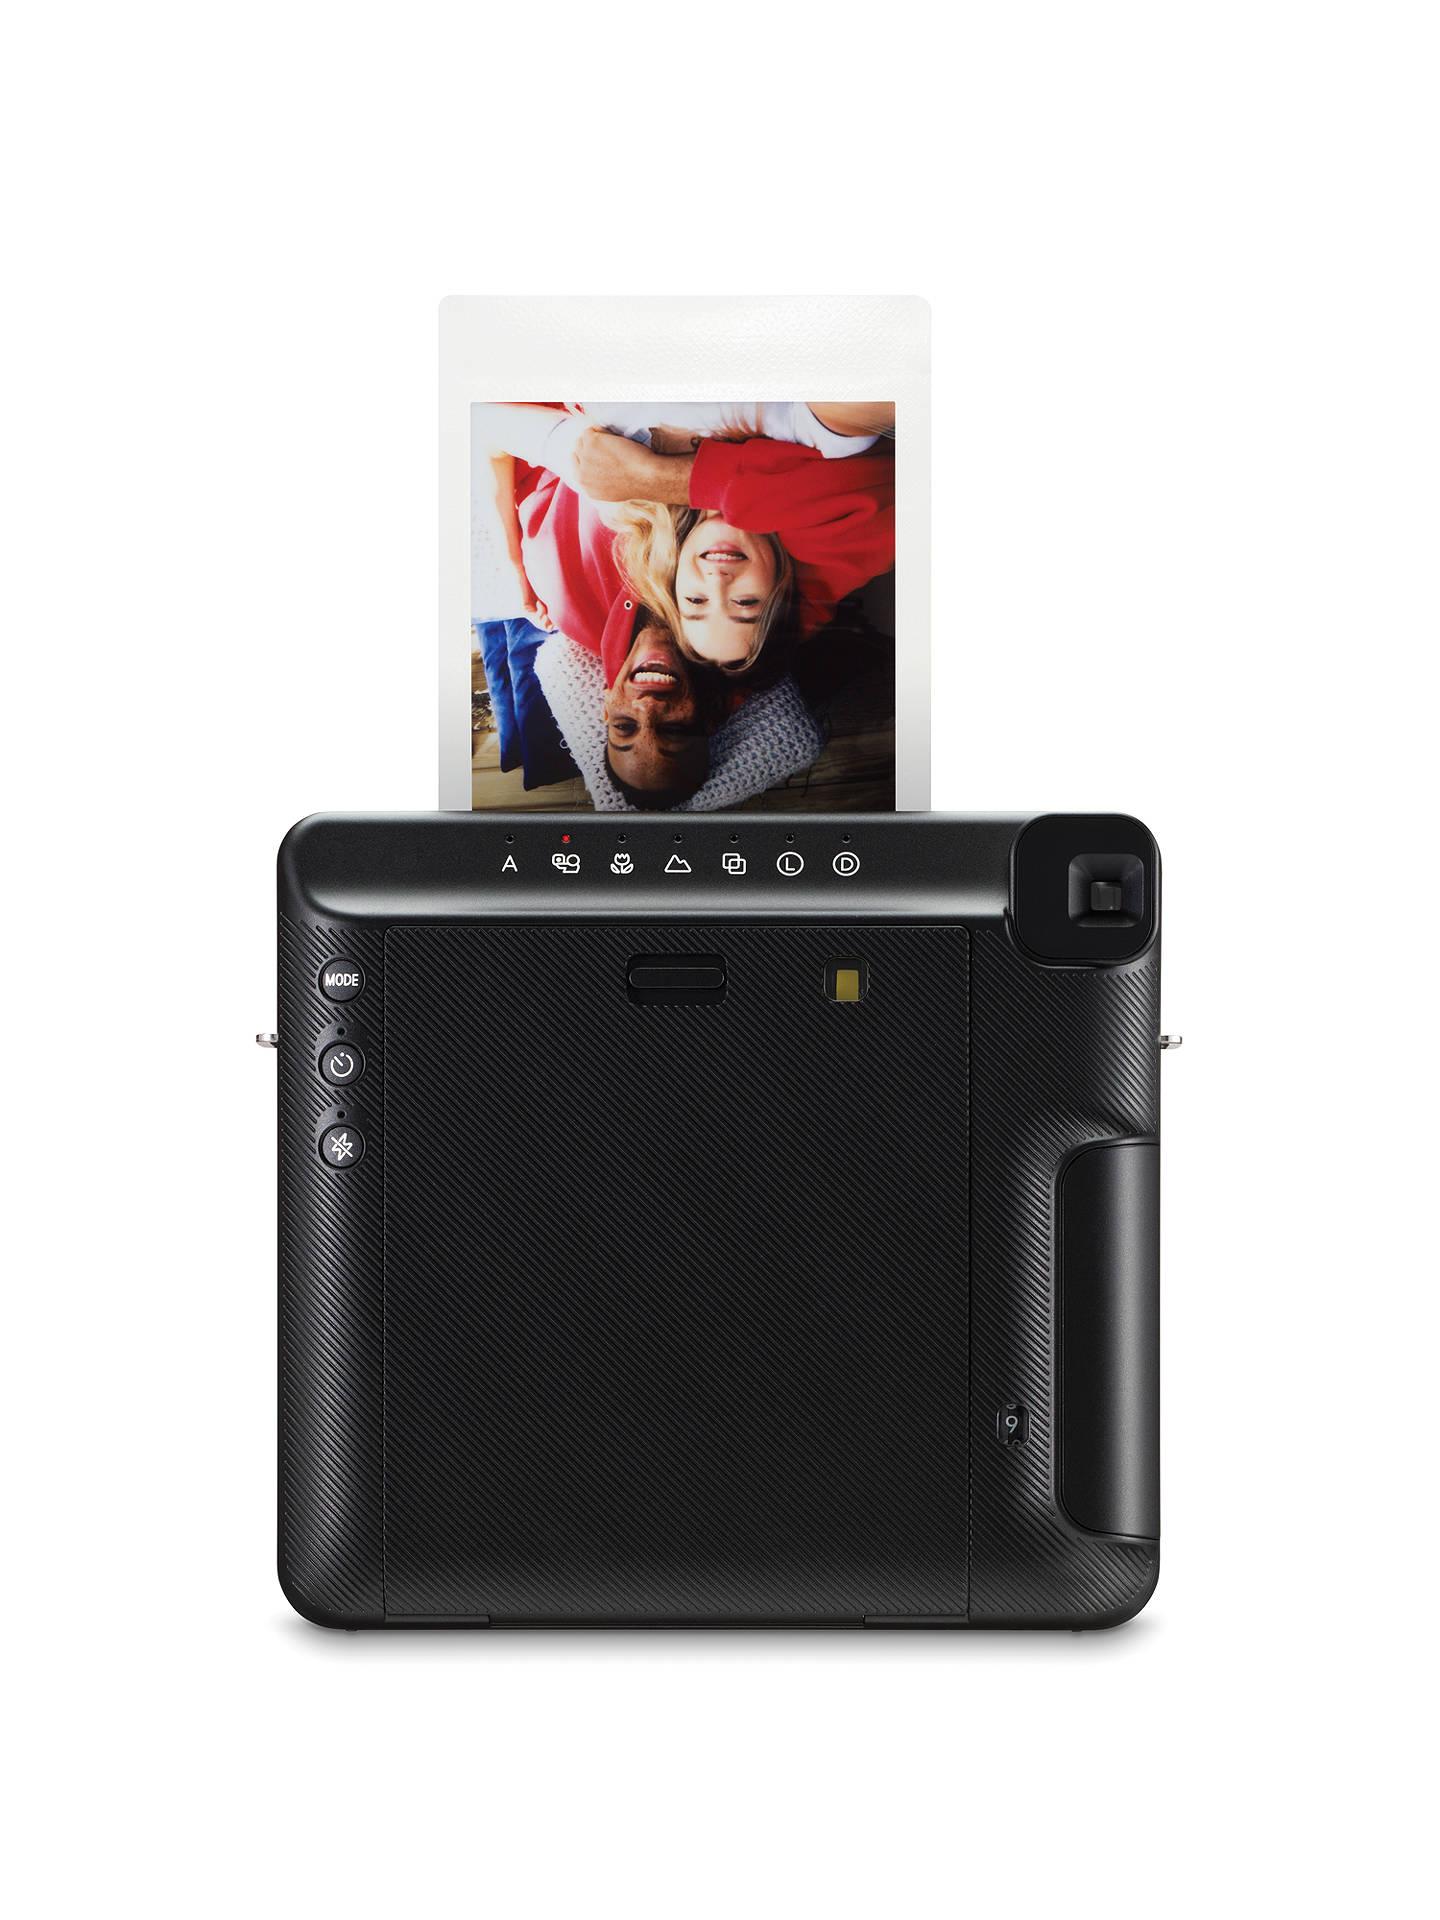 Fujifilm Instax SQUARE SQ6 Instant Camera with Selfie Mode, Built-In Flash  & Shoulder Strap, Graphite Grey